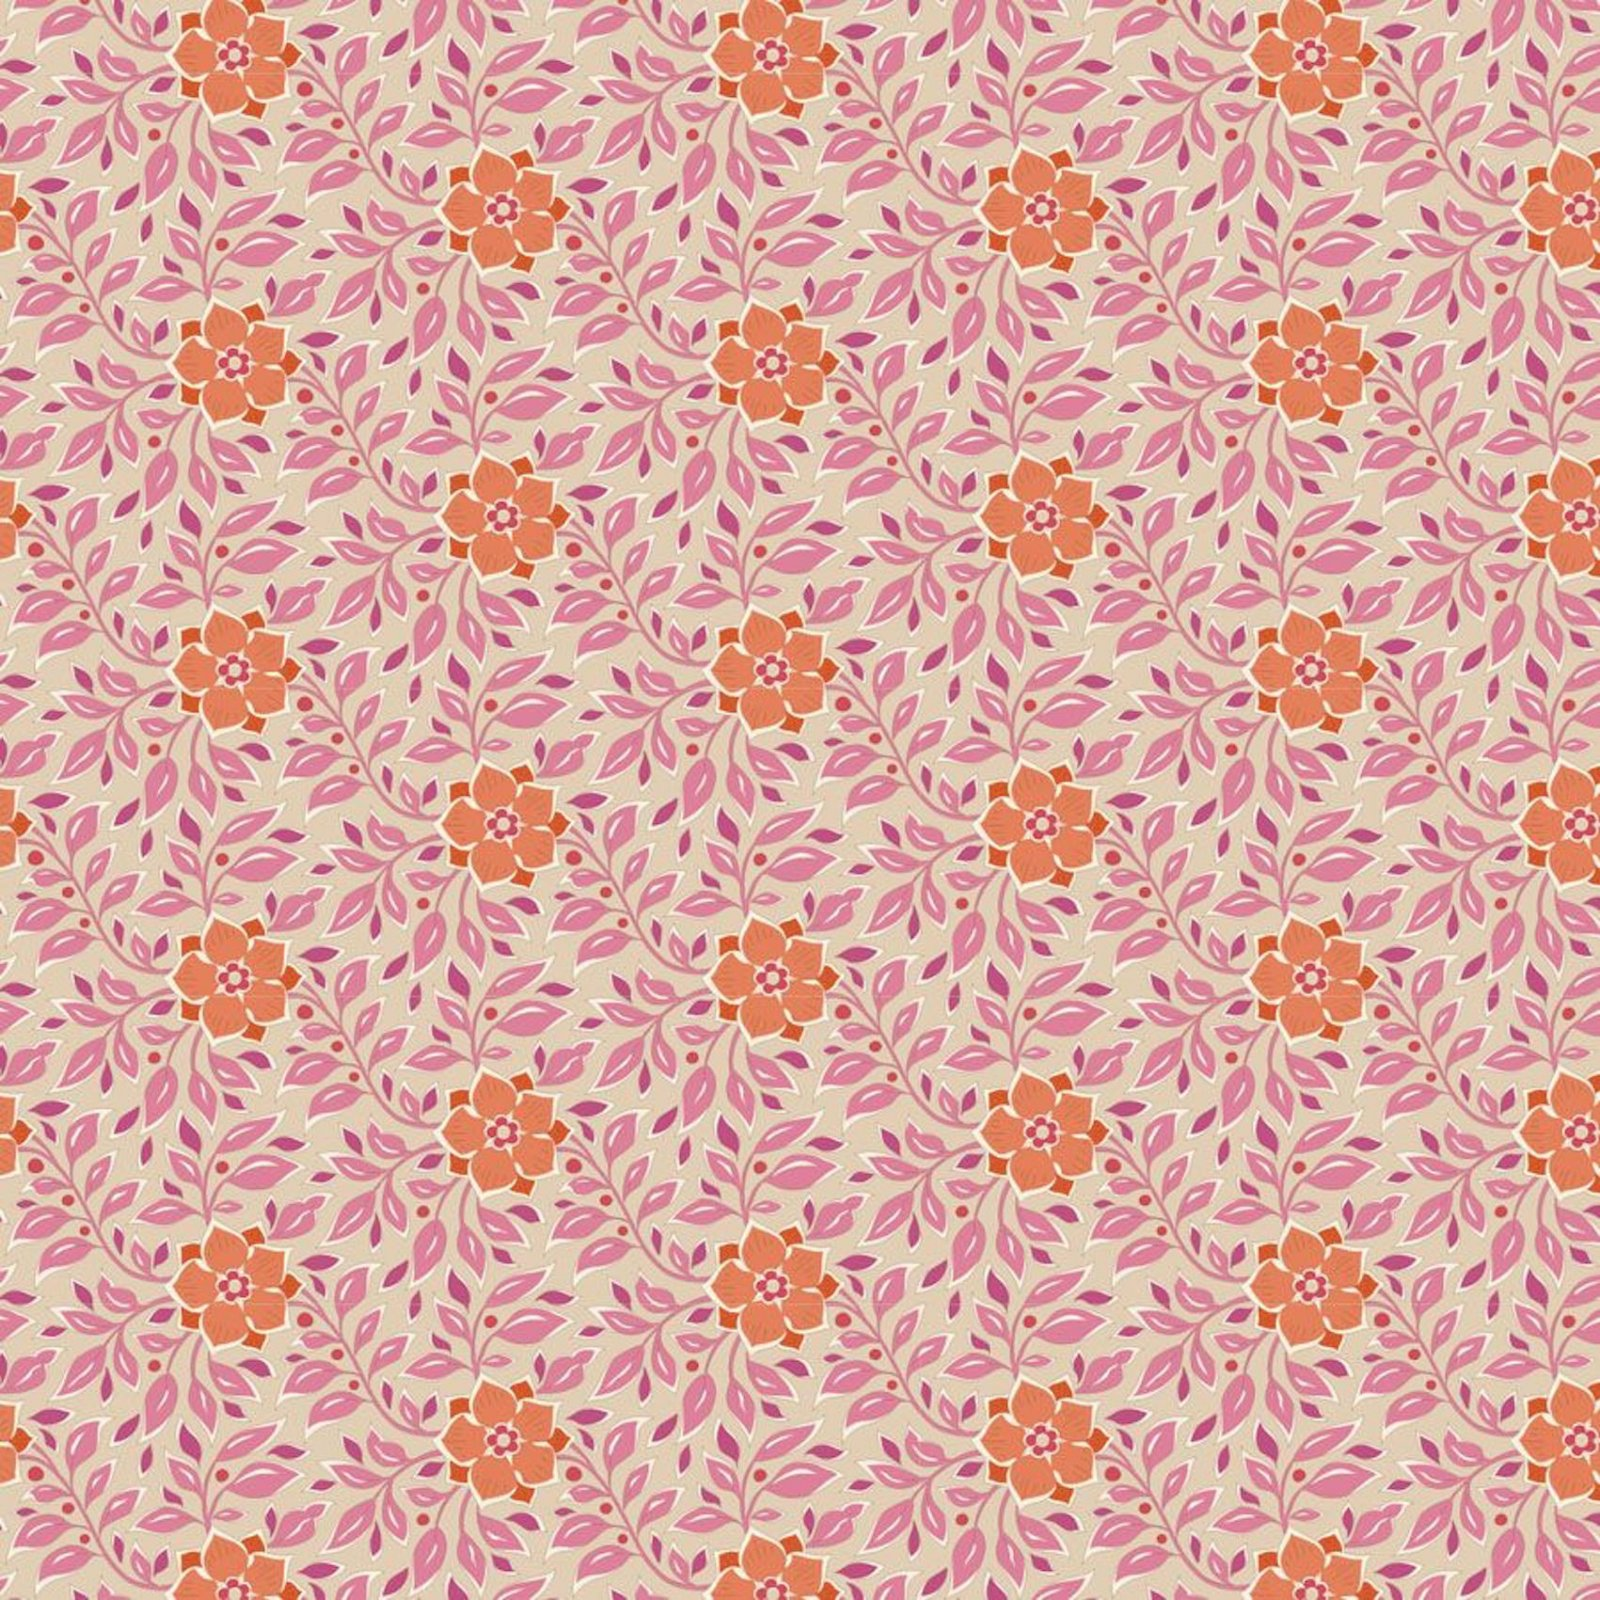 PRE-ORDER  - Tilda - Windy Days - Wendy Floral Pink